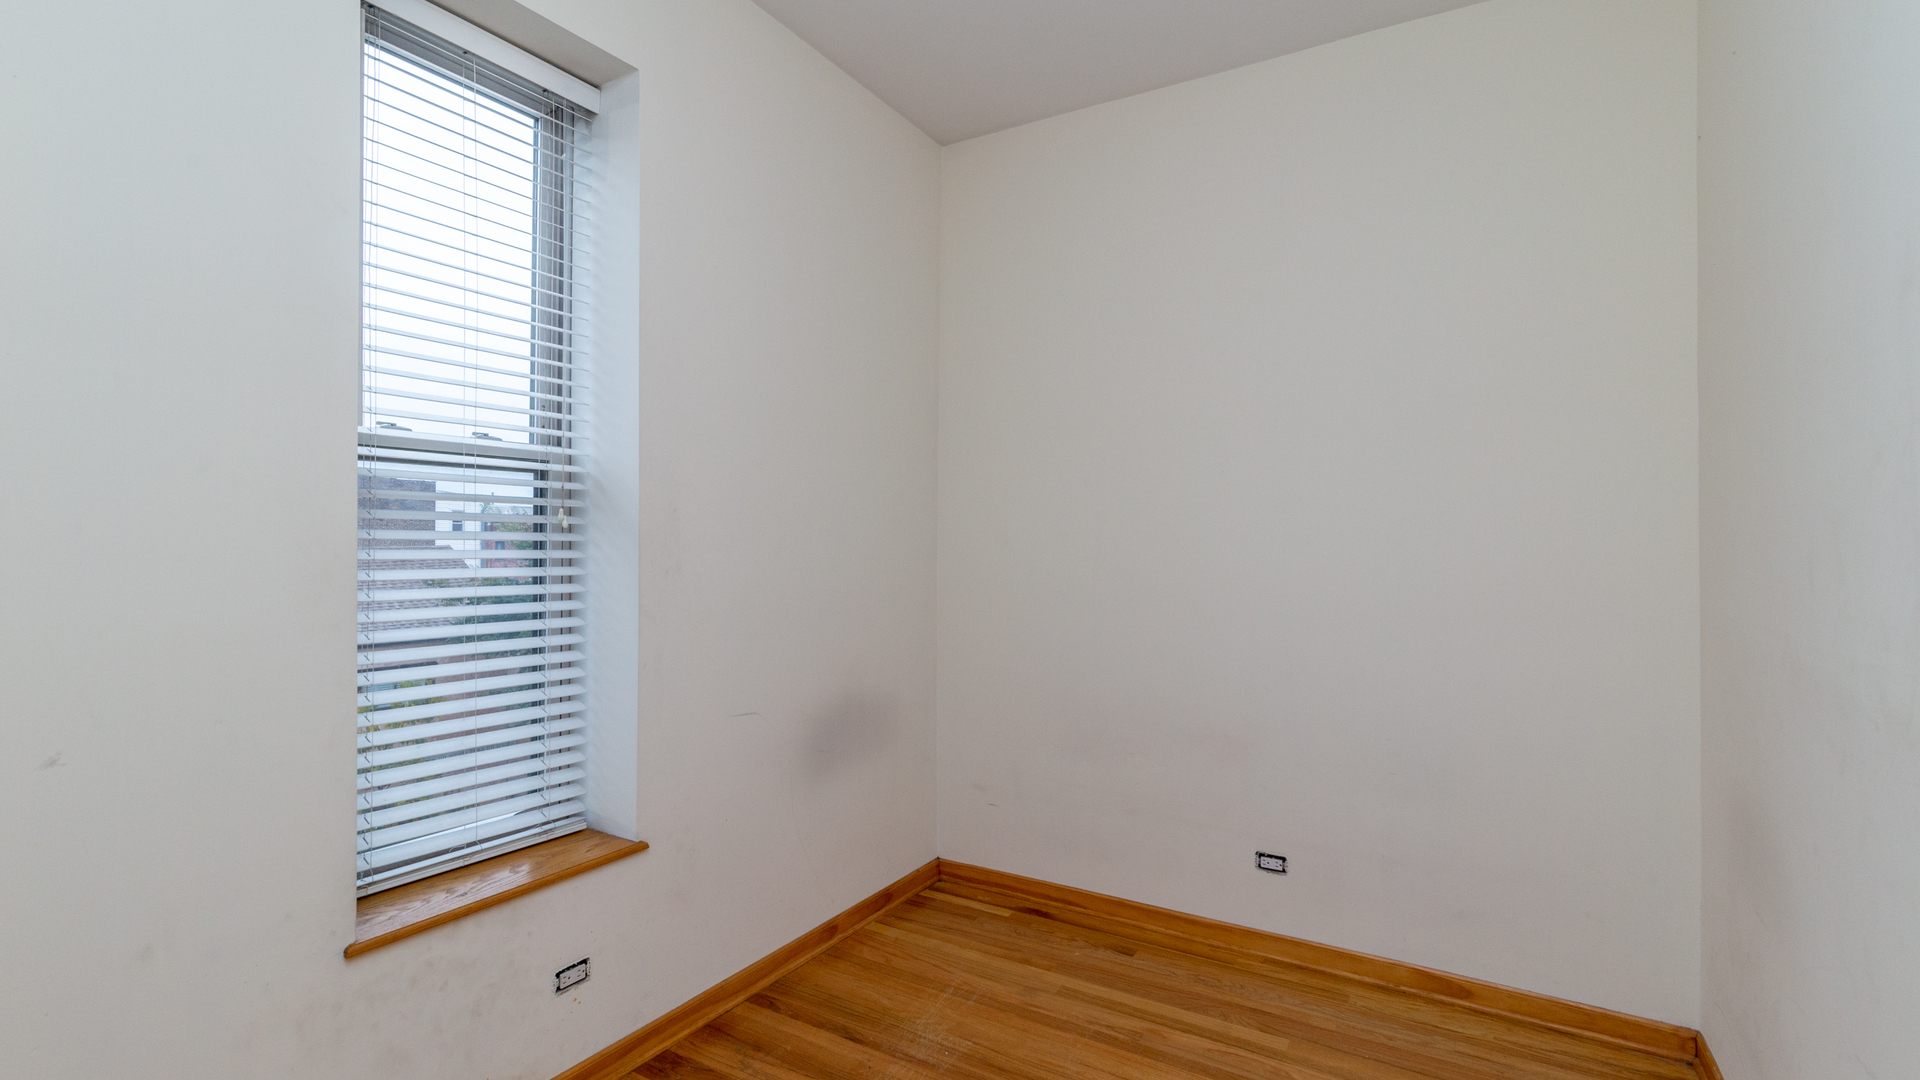 1000 S Loomis St apartments for rent at AptAmigo